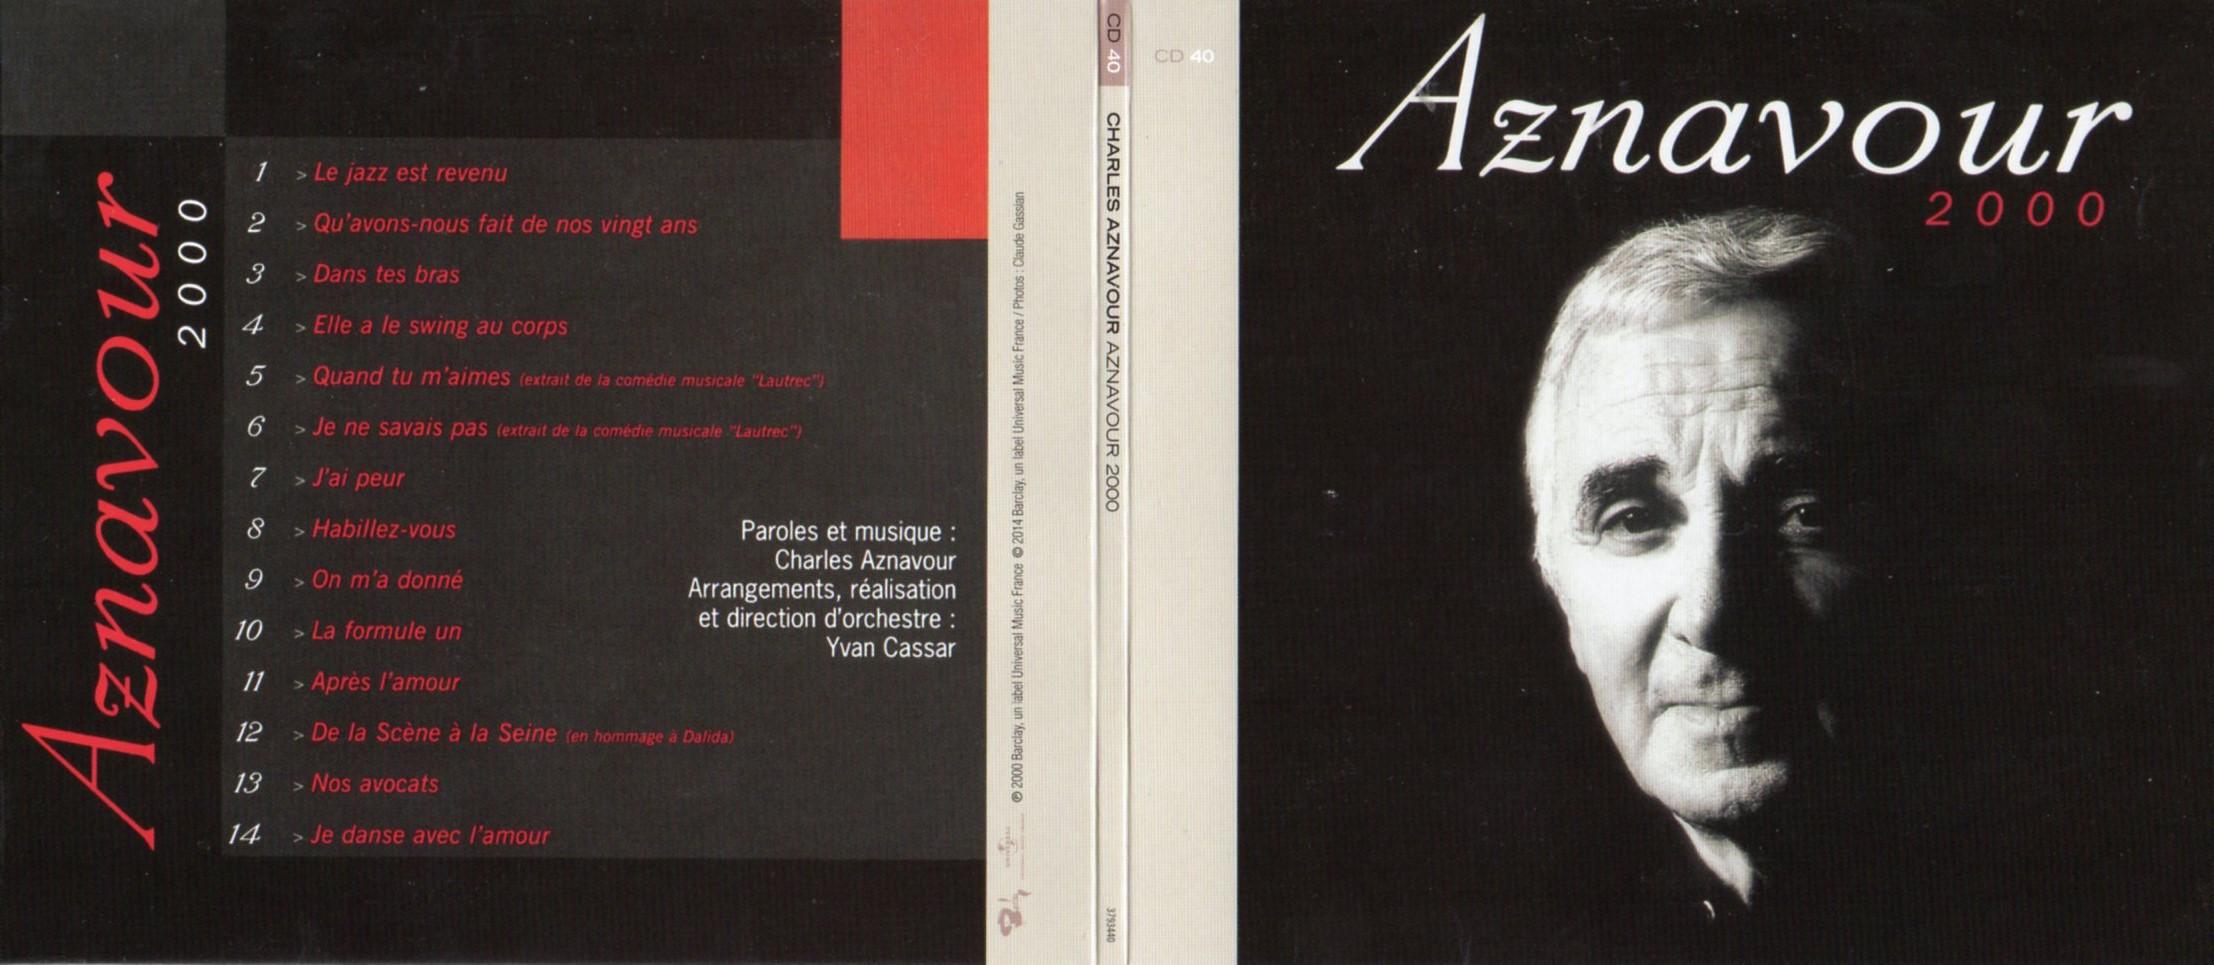 CHARLES AZNAVOUR - Aznavour 2000 (2000) Gatefold Card board sleeve - CD